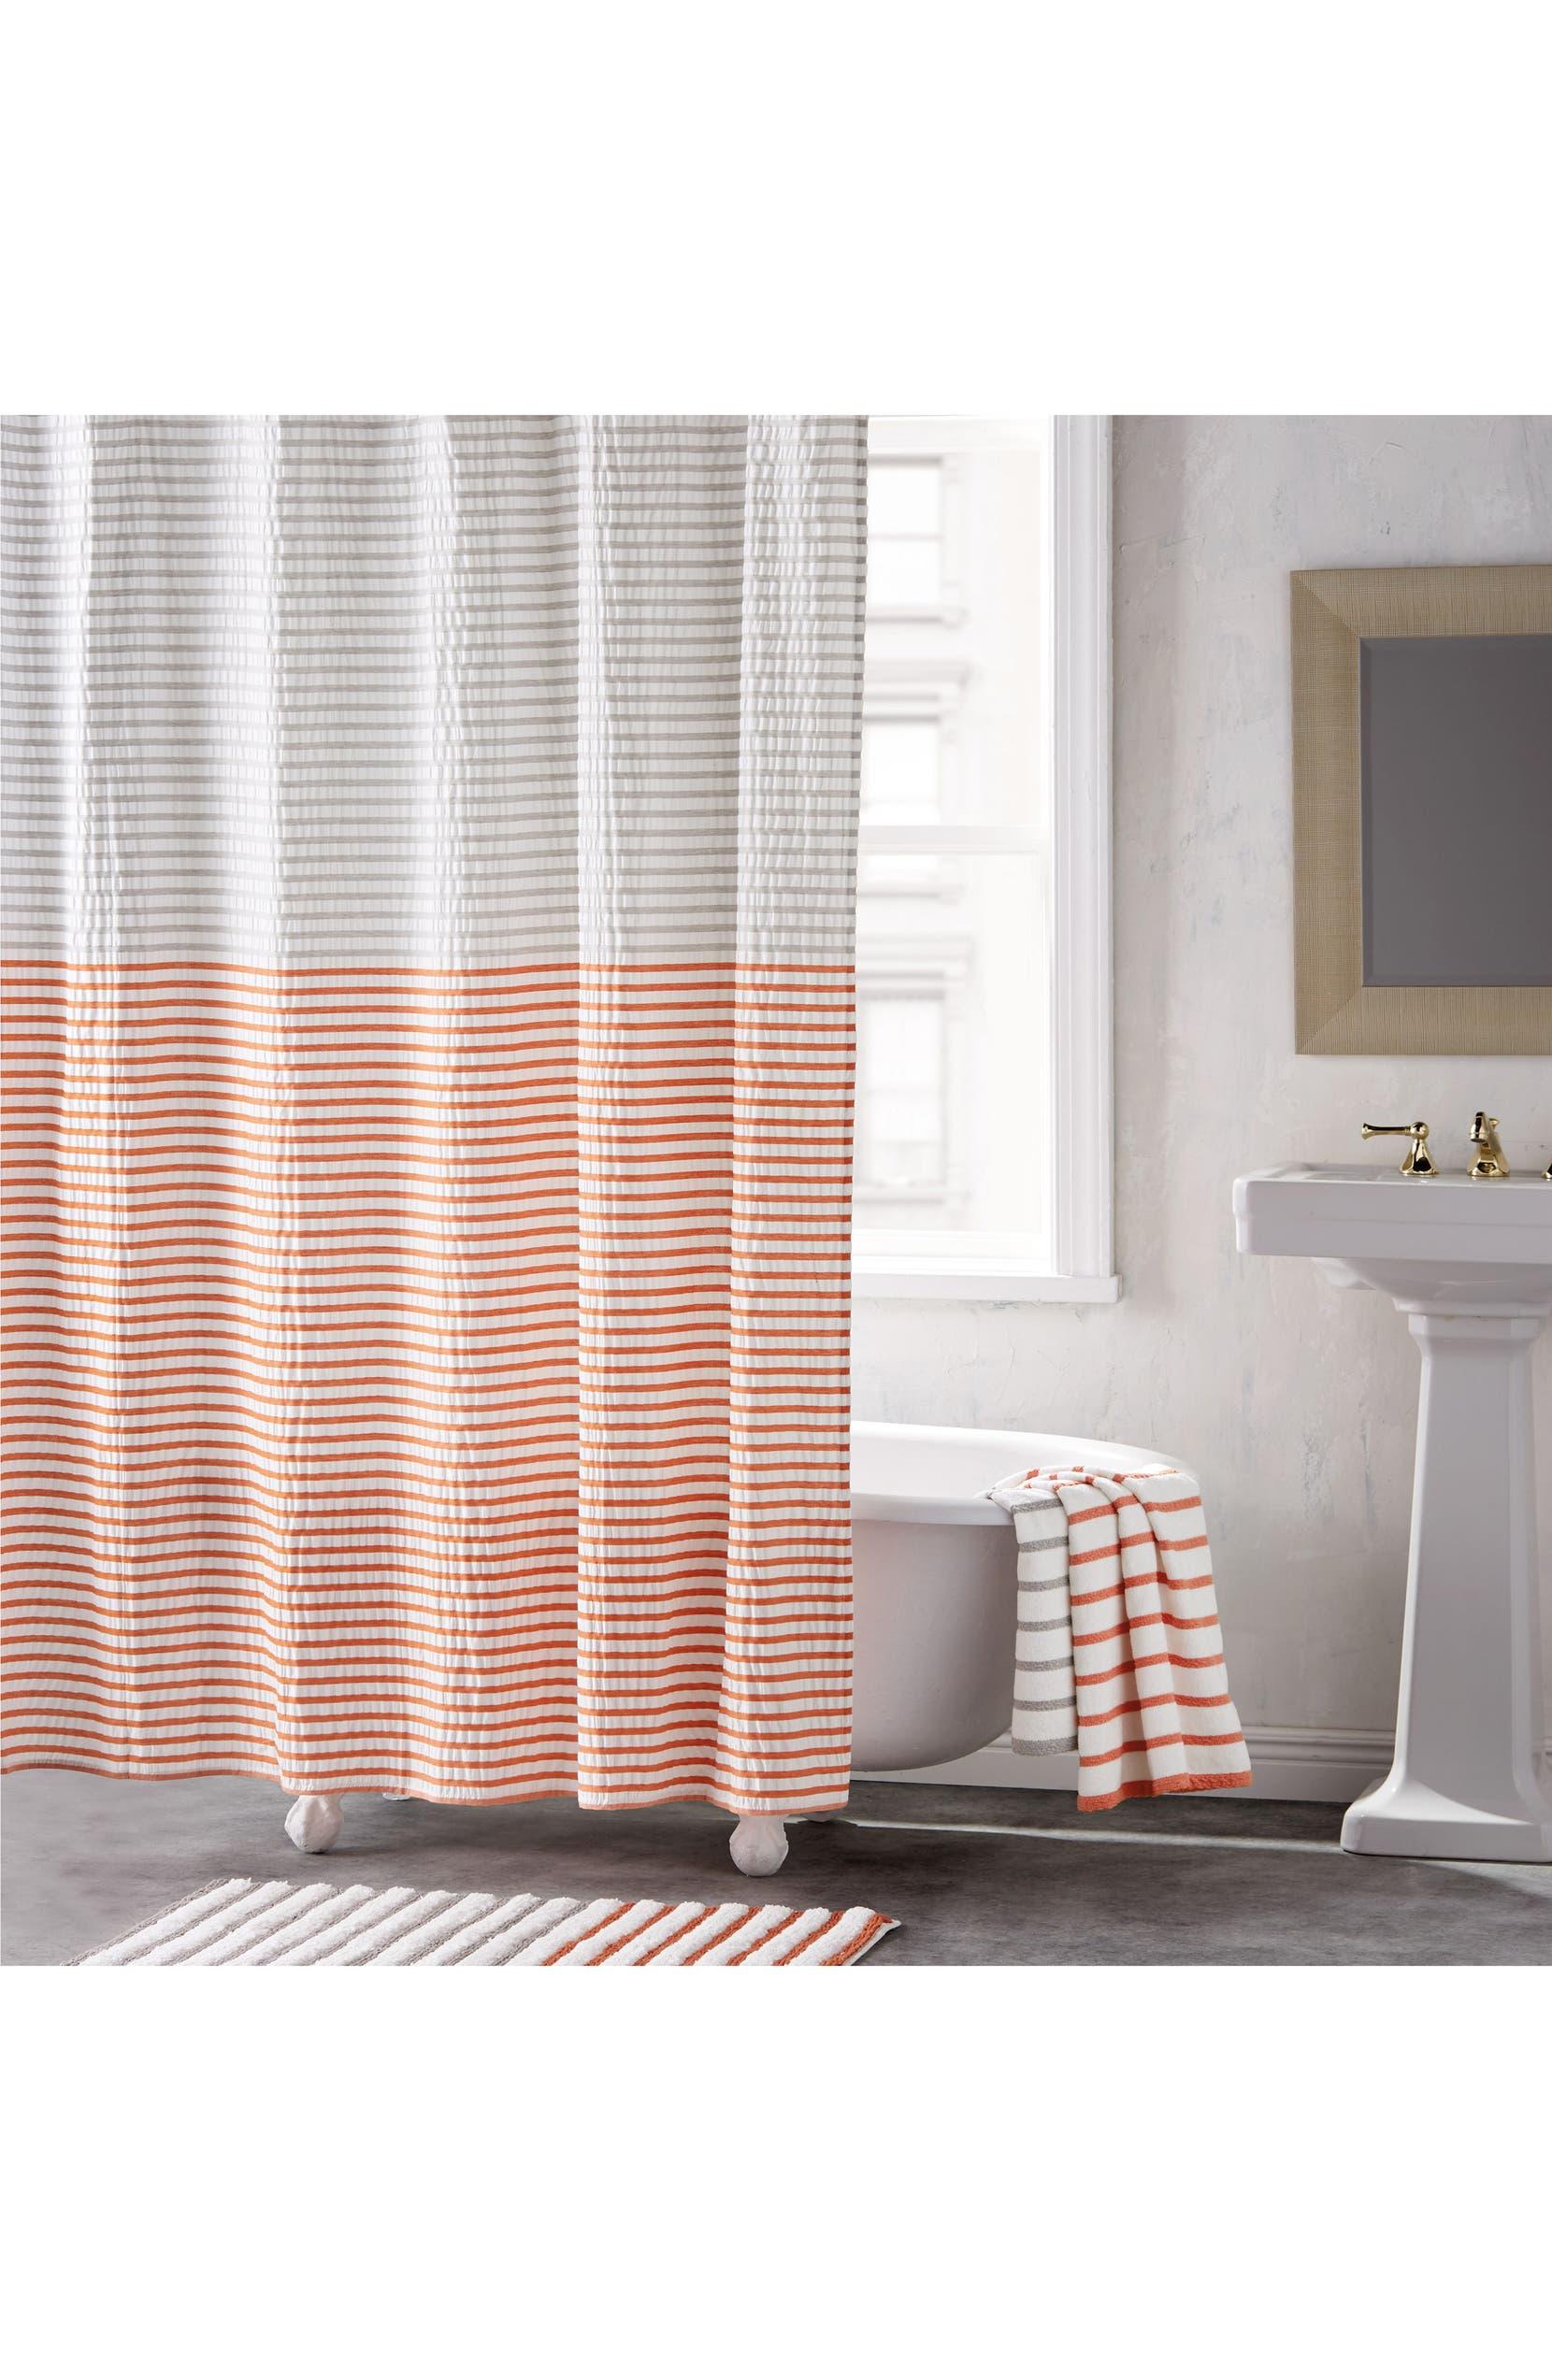 de30ac89dabef1 DKNY Parson Stripe Shower Curtain